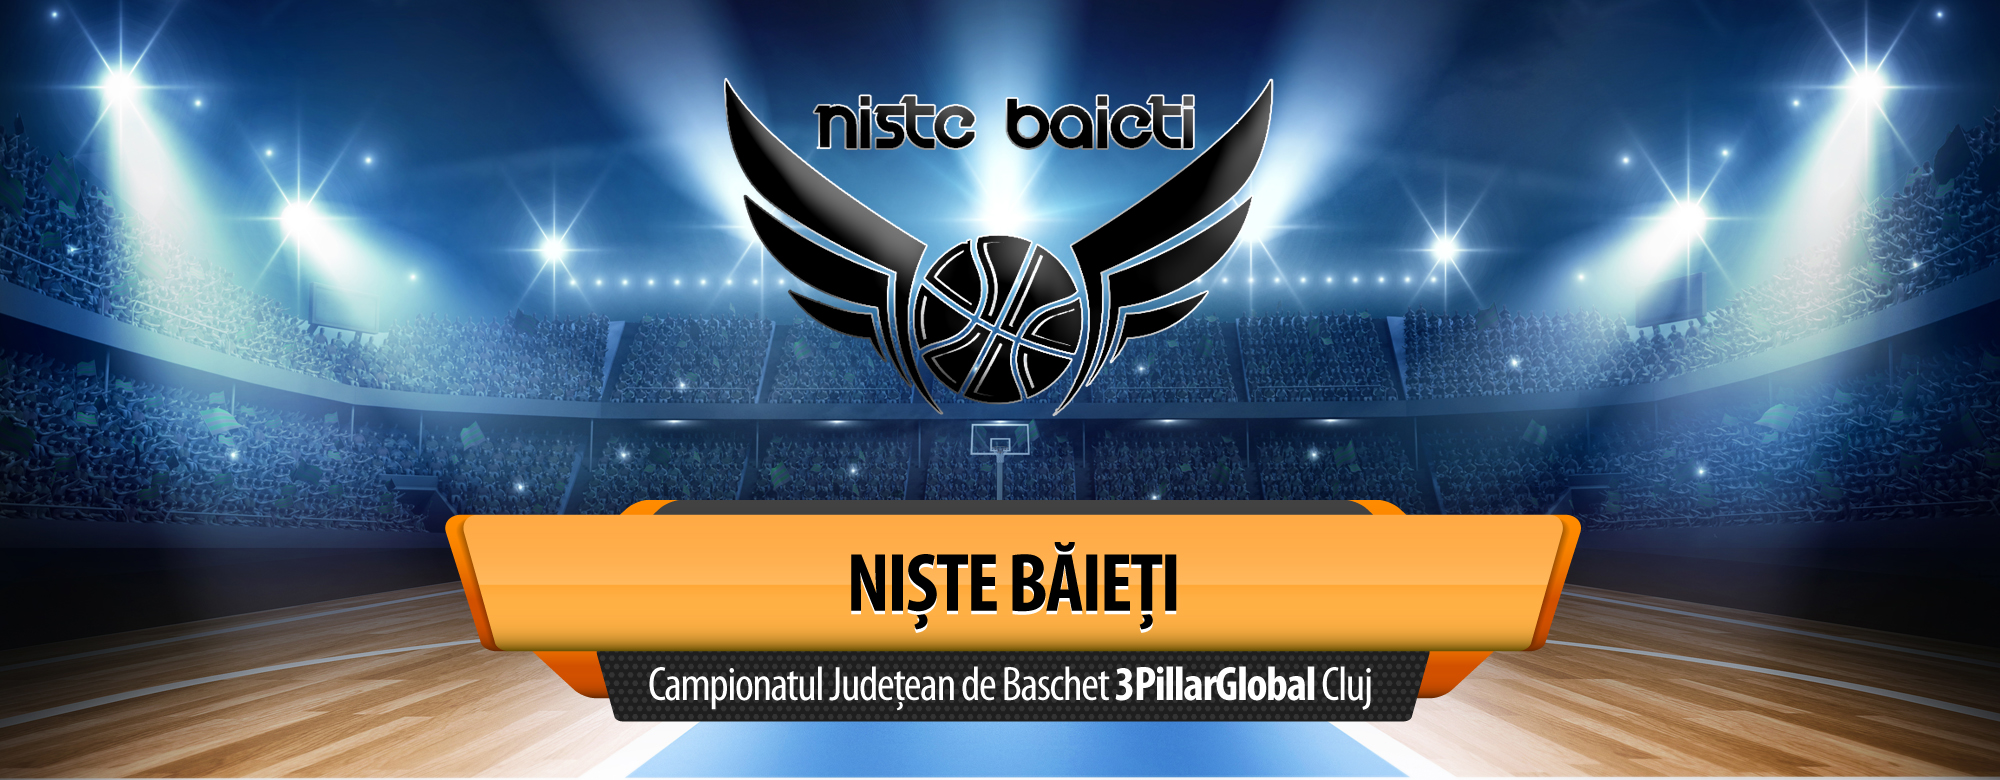 Header-Notes-Niste-Baieti